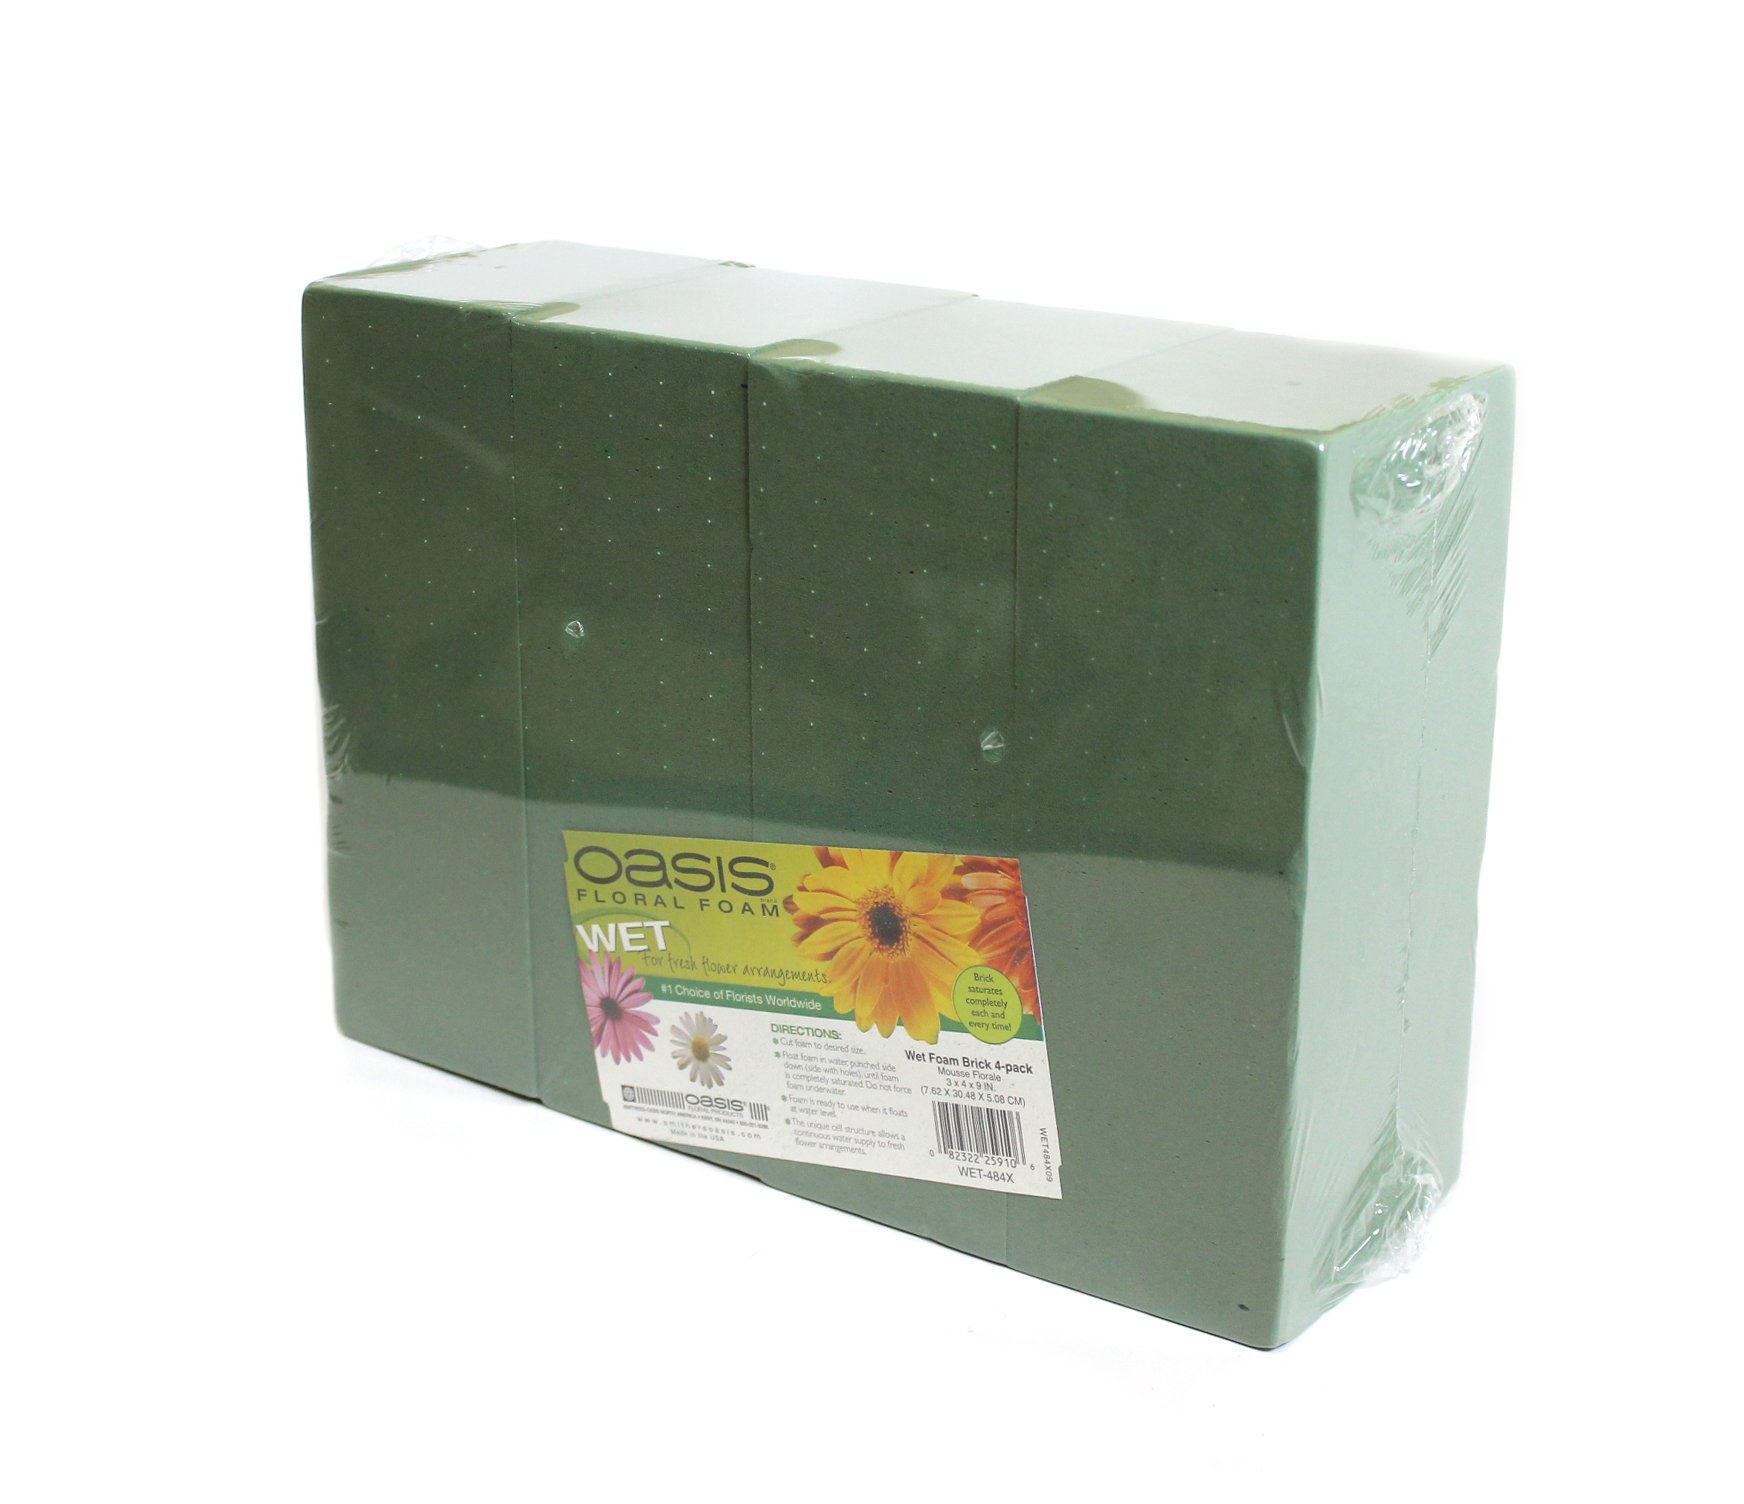 Oasis Floral Foam Bricks Standard Maxlife Pack of 4